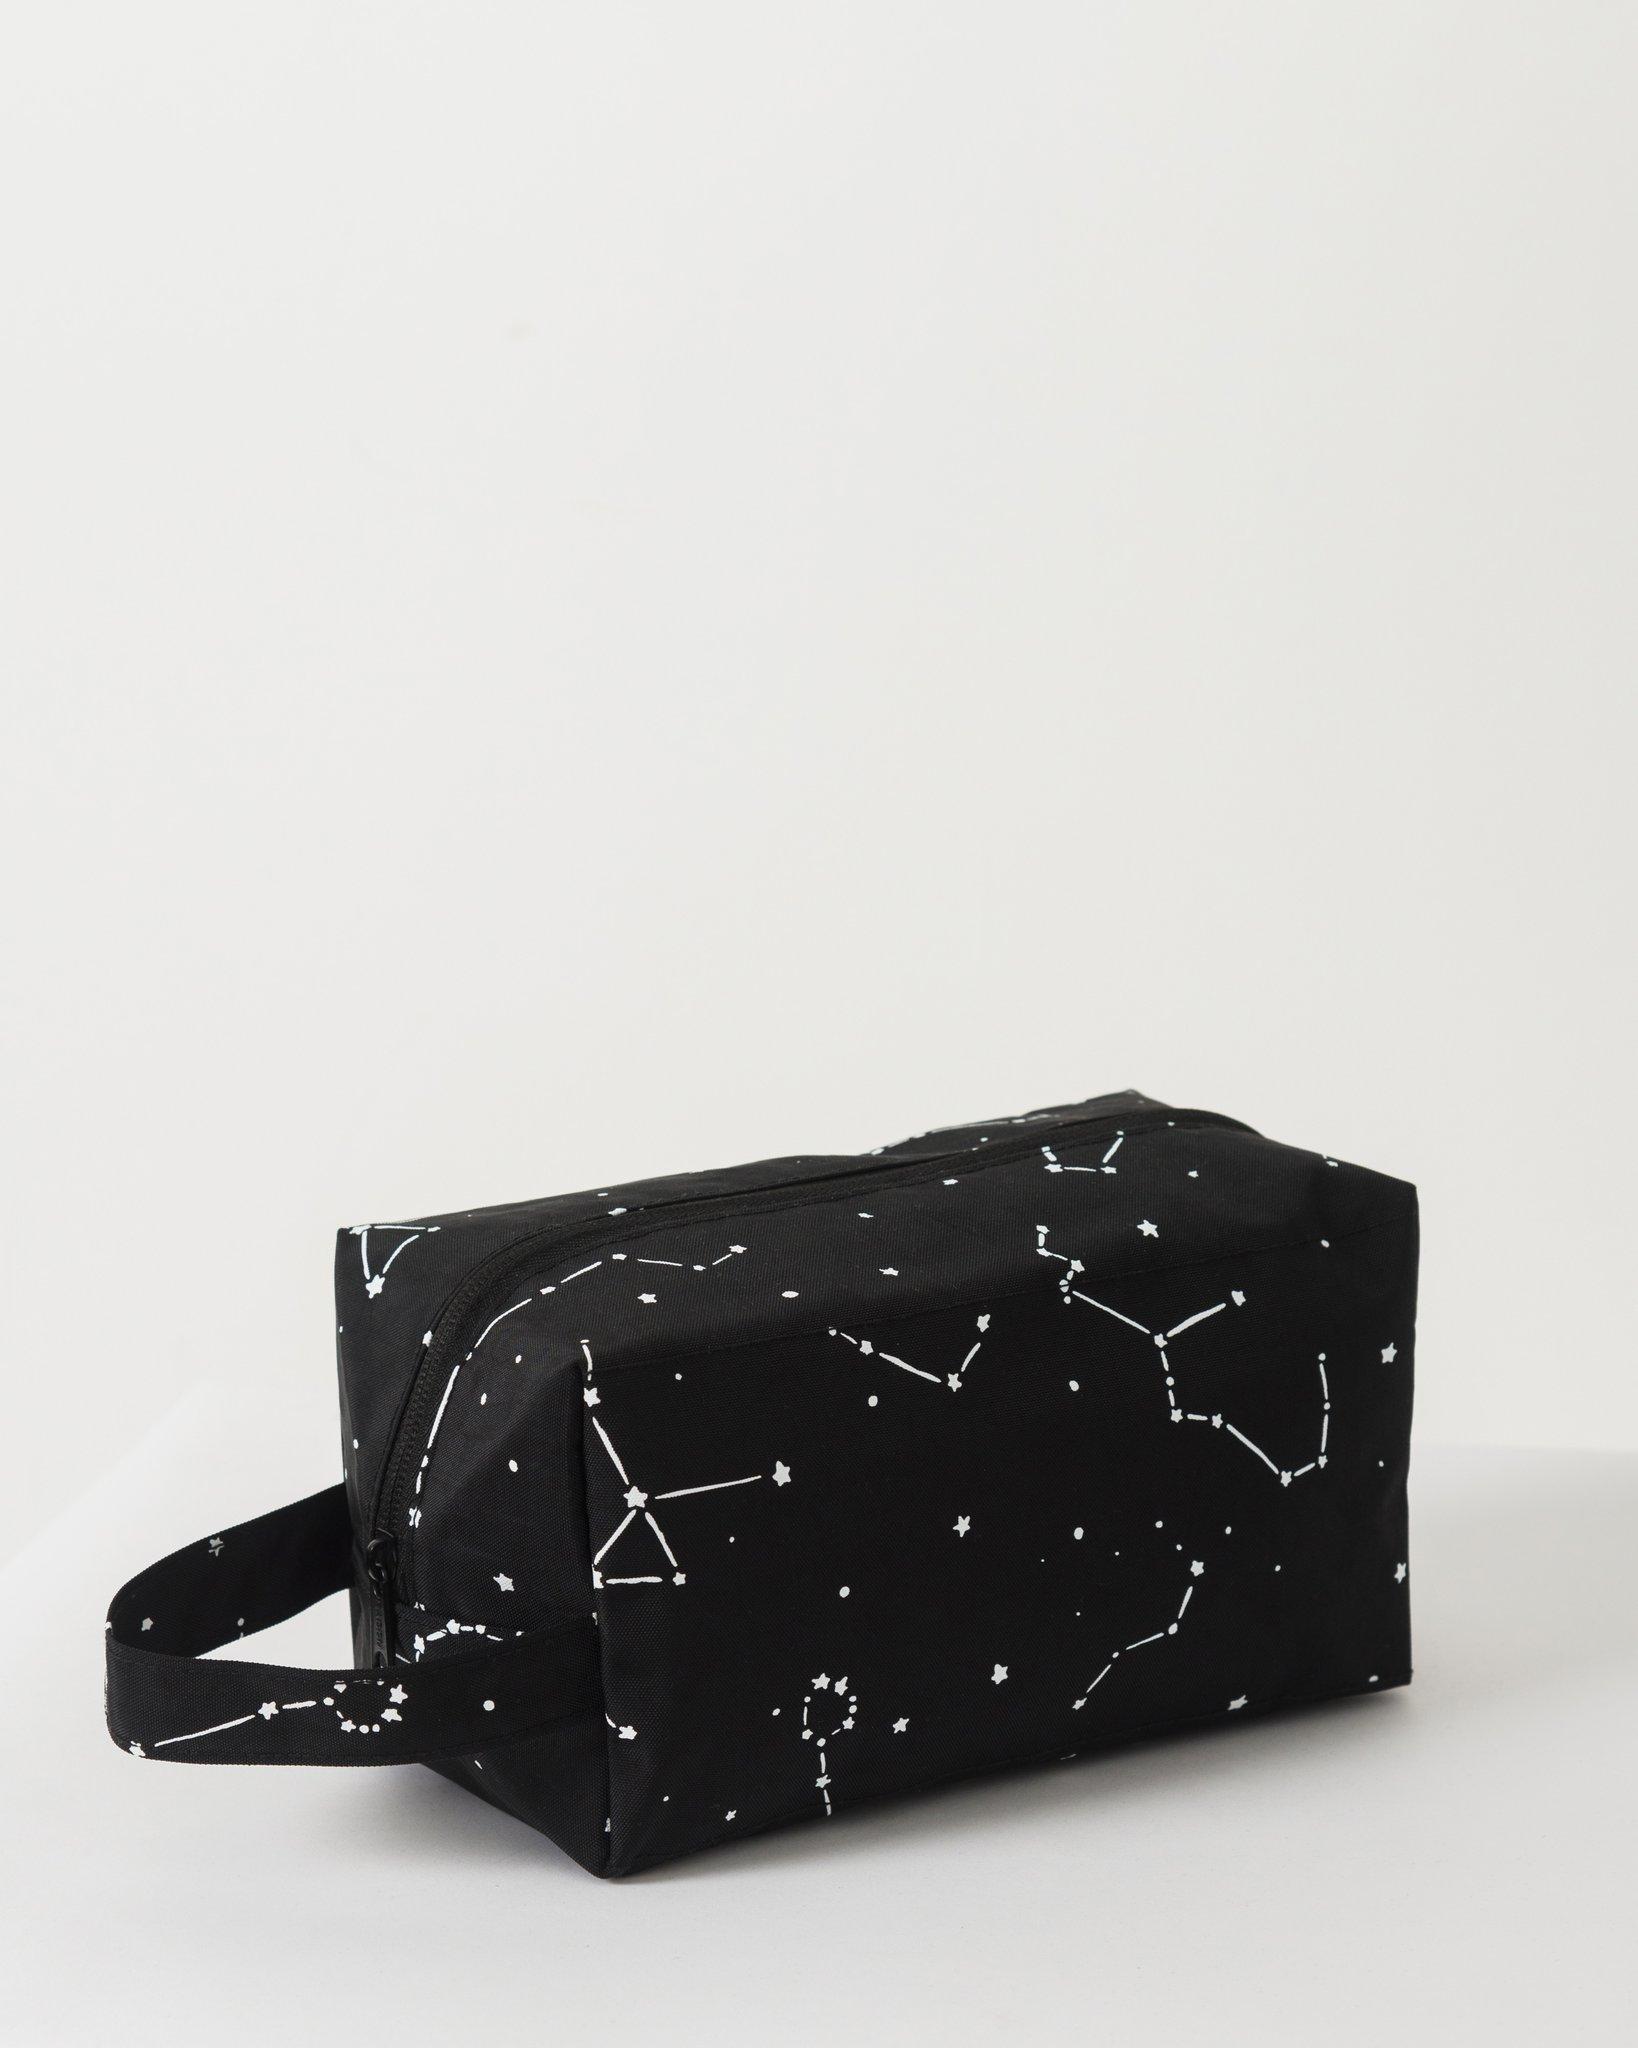 Dopp_Kit_Heavyweight_Black_Constellation-01_2048x2048.jpg